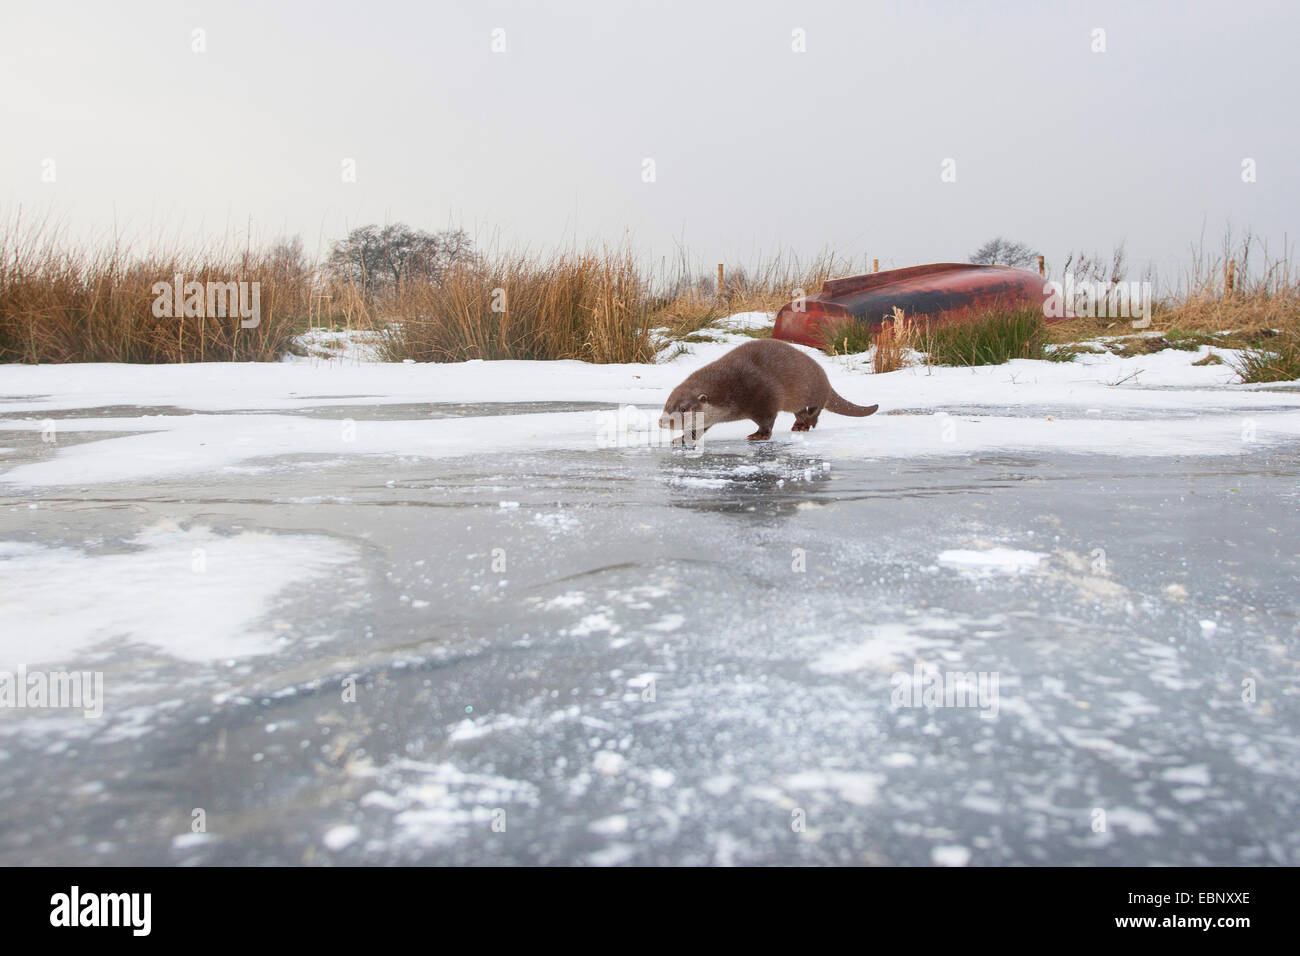 Europäischen Fischotter, europäischer Fischotter, eurasische Fischotter (Lutra Lutra), weibliche im Schnee Stockbild